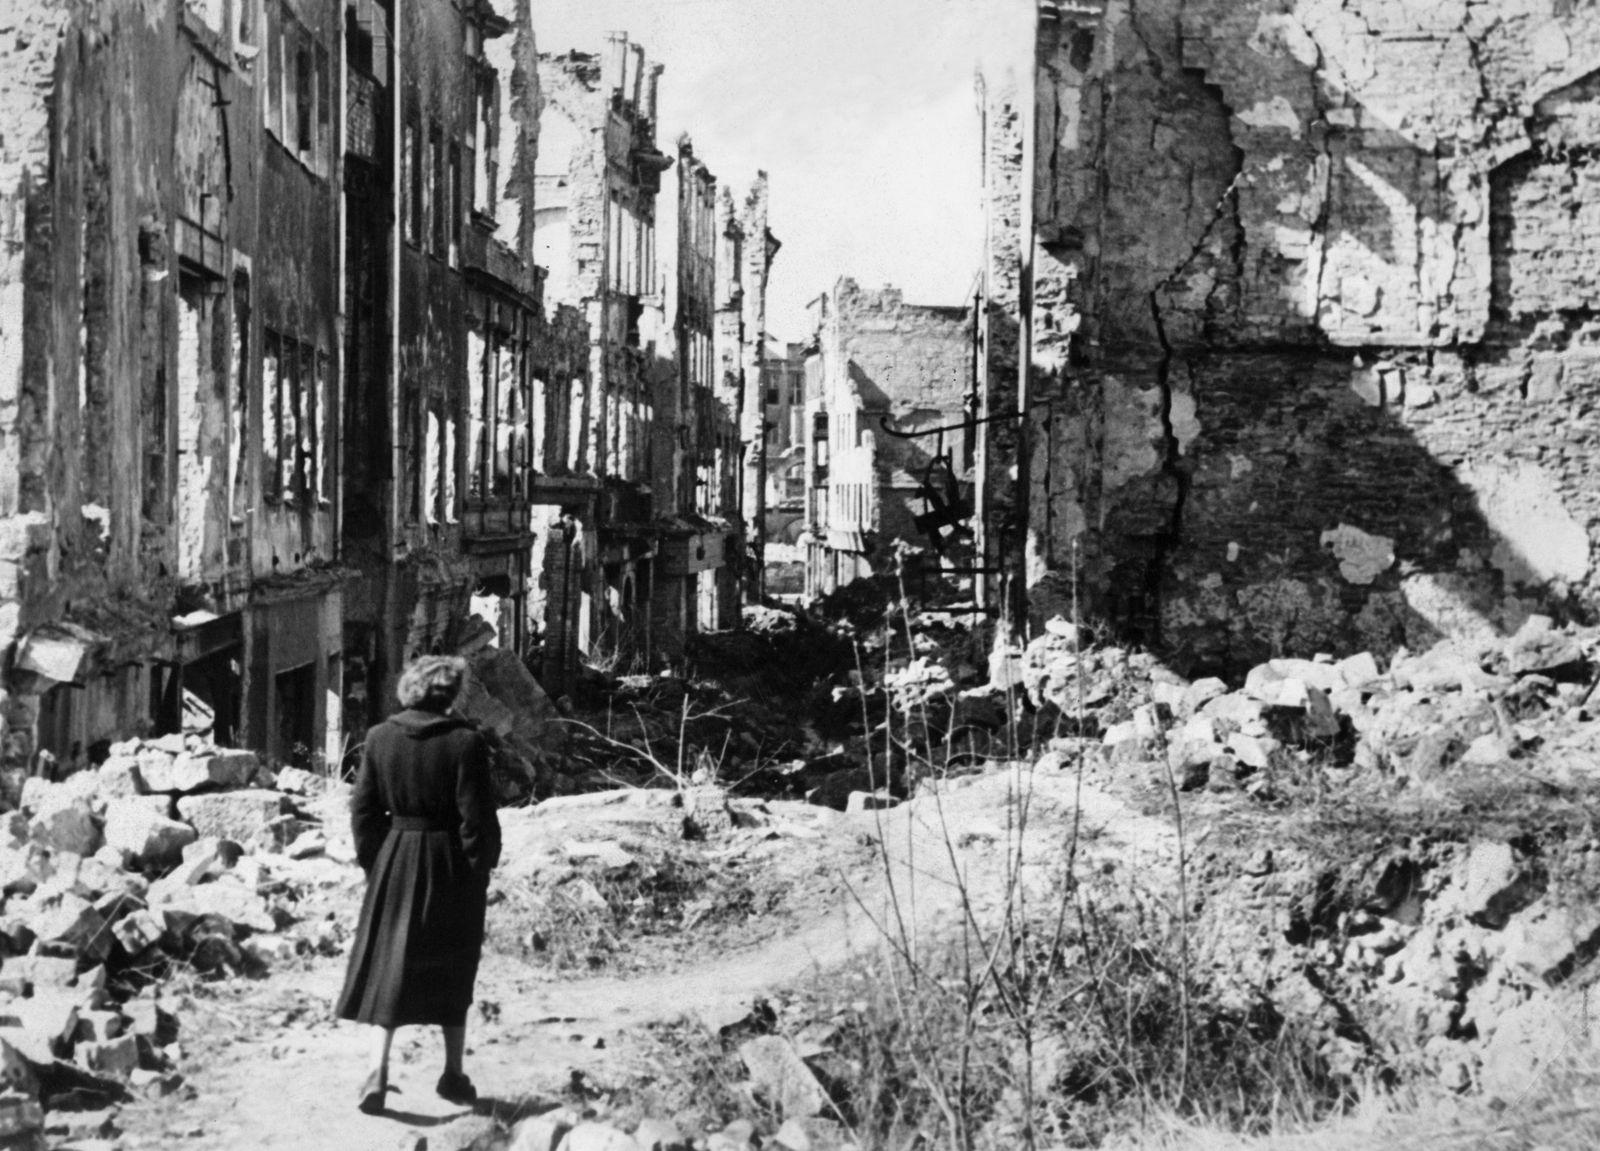 Vox-Dokumentation «1945 - 12 Städte, 12 Schicksale»